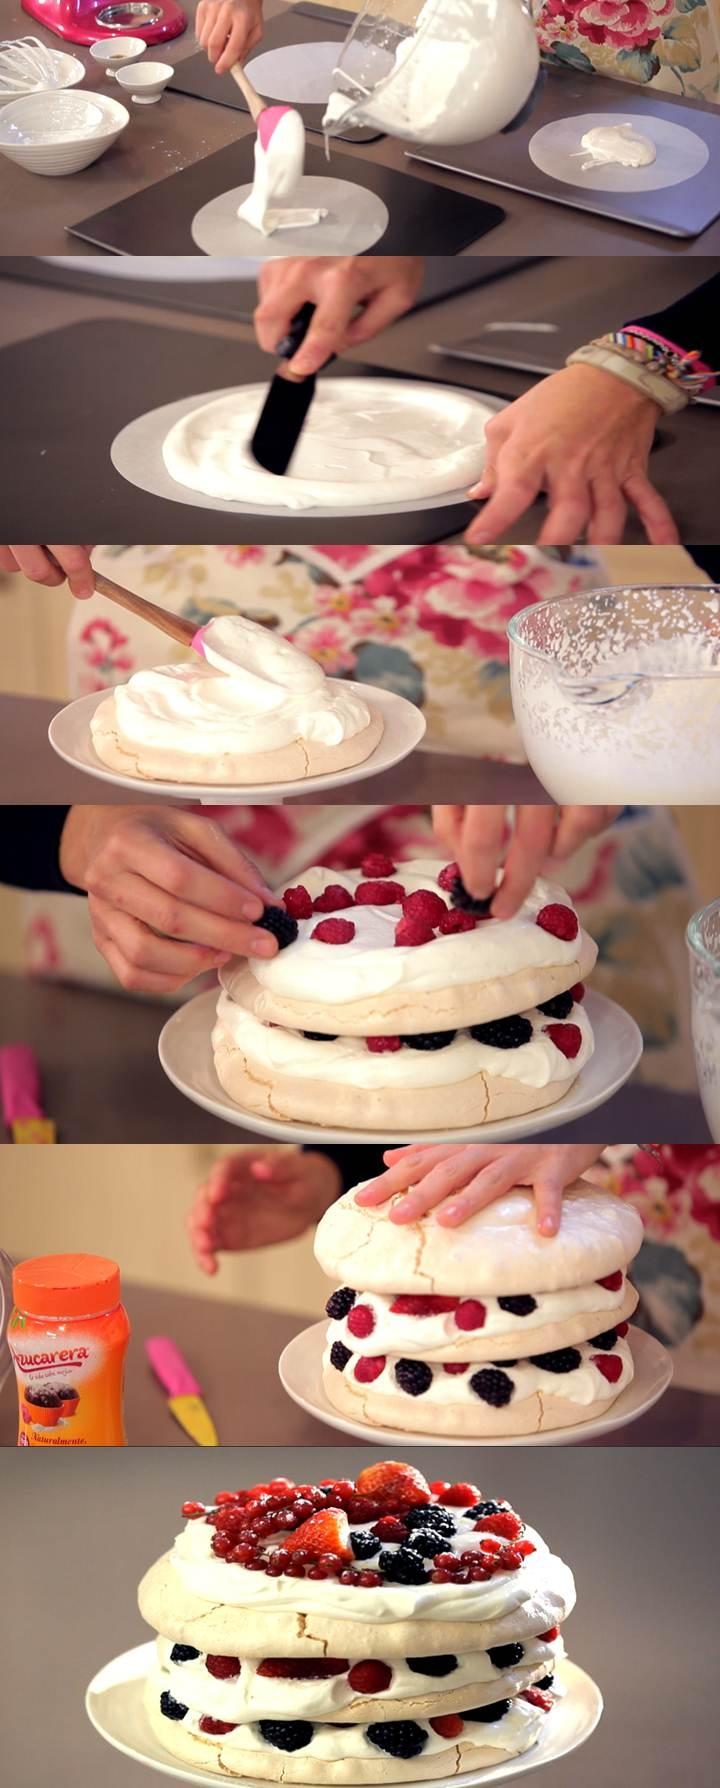 32 best images about recetas kitchenaid on pinterest for Pane con kitchenaid